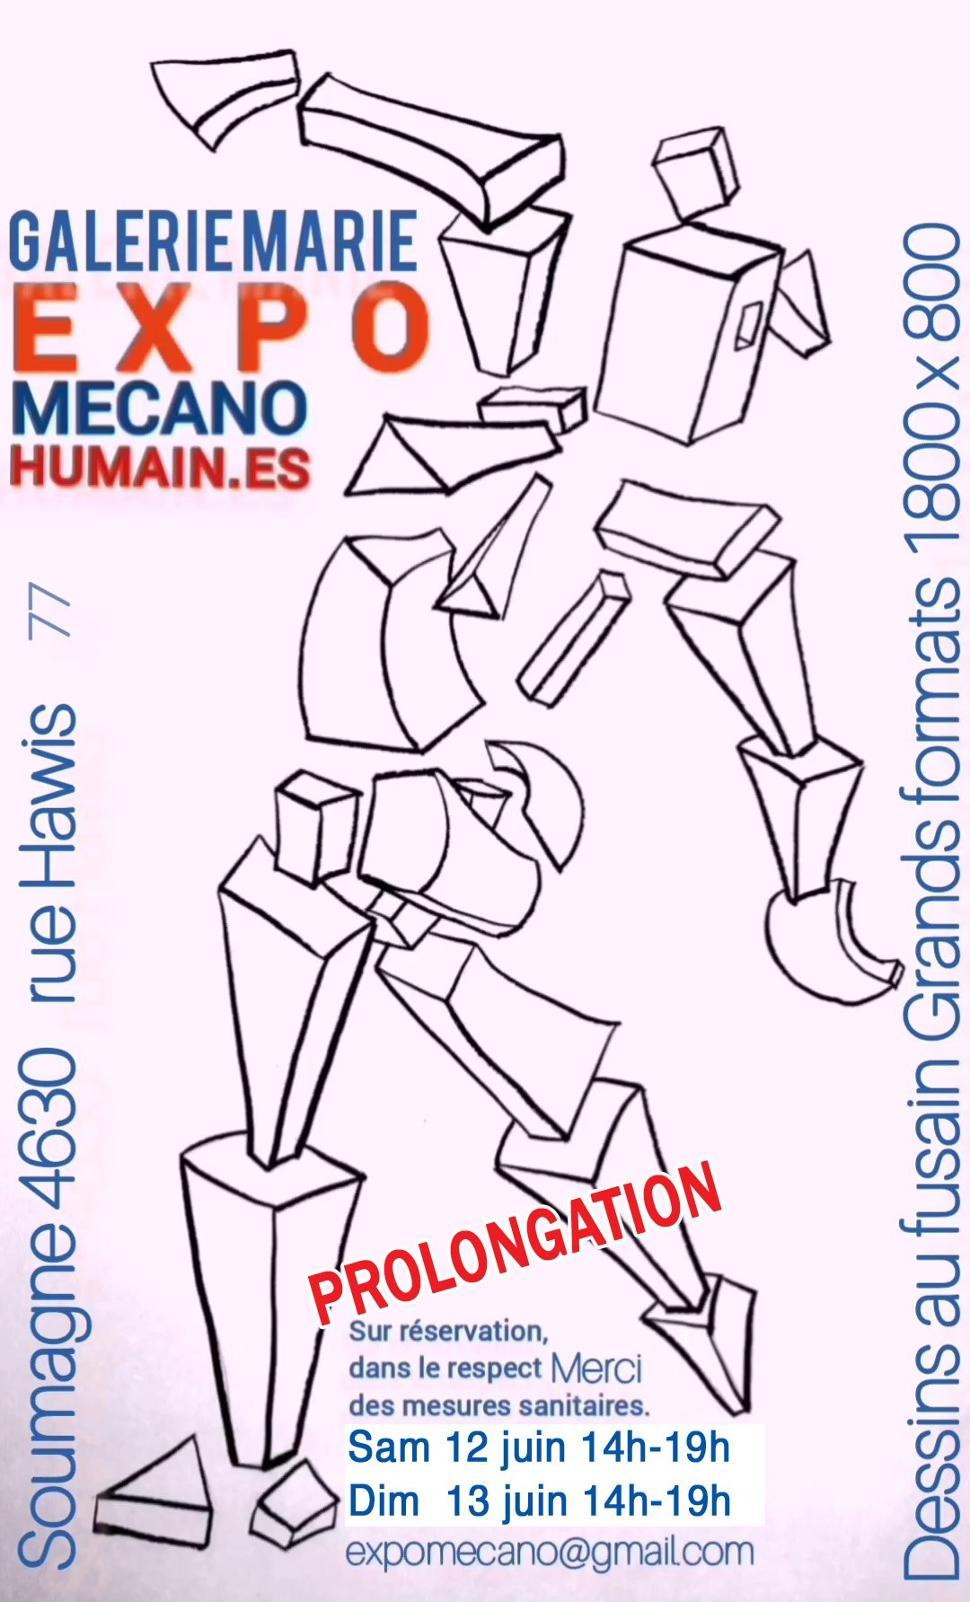 Expo Mecano Humain.es ©Expo Mecano Humain.es 06-2021